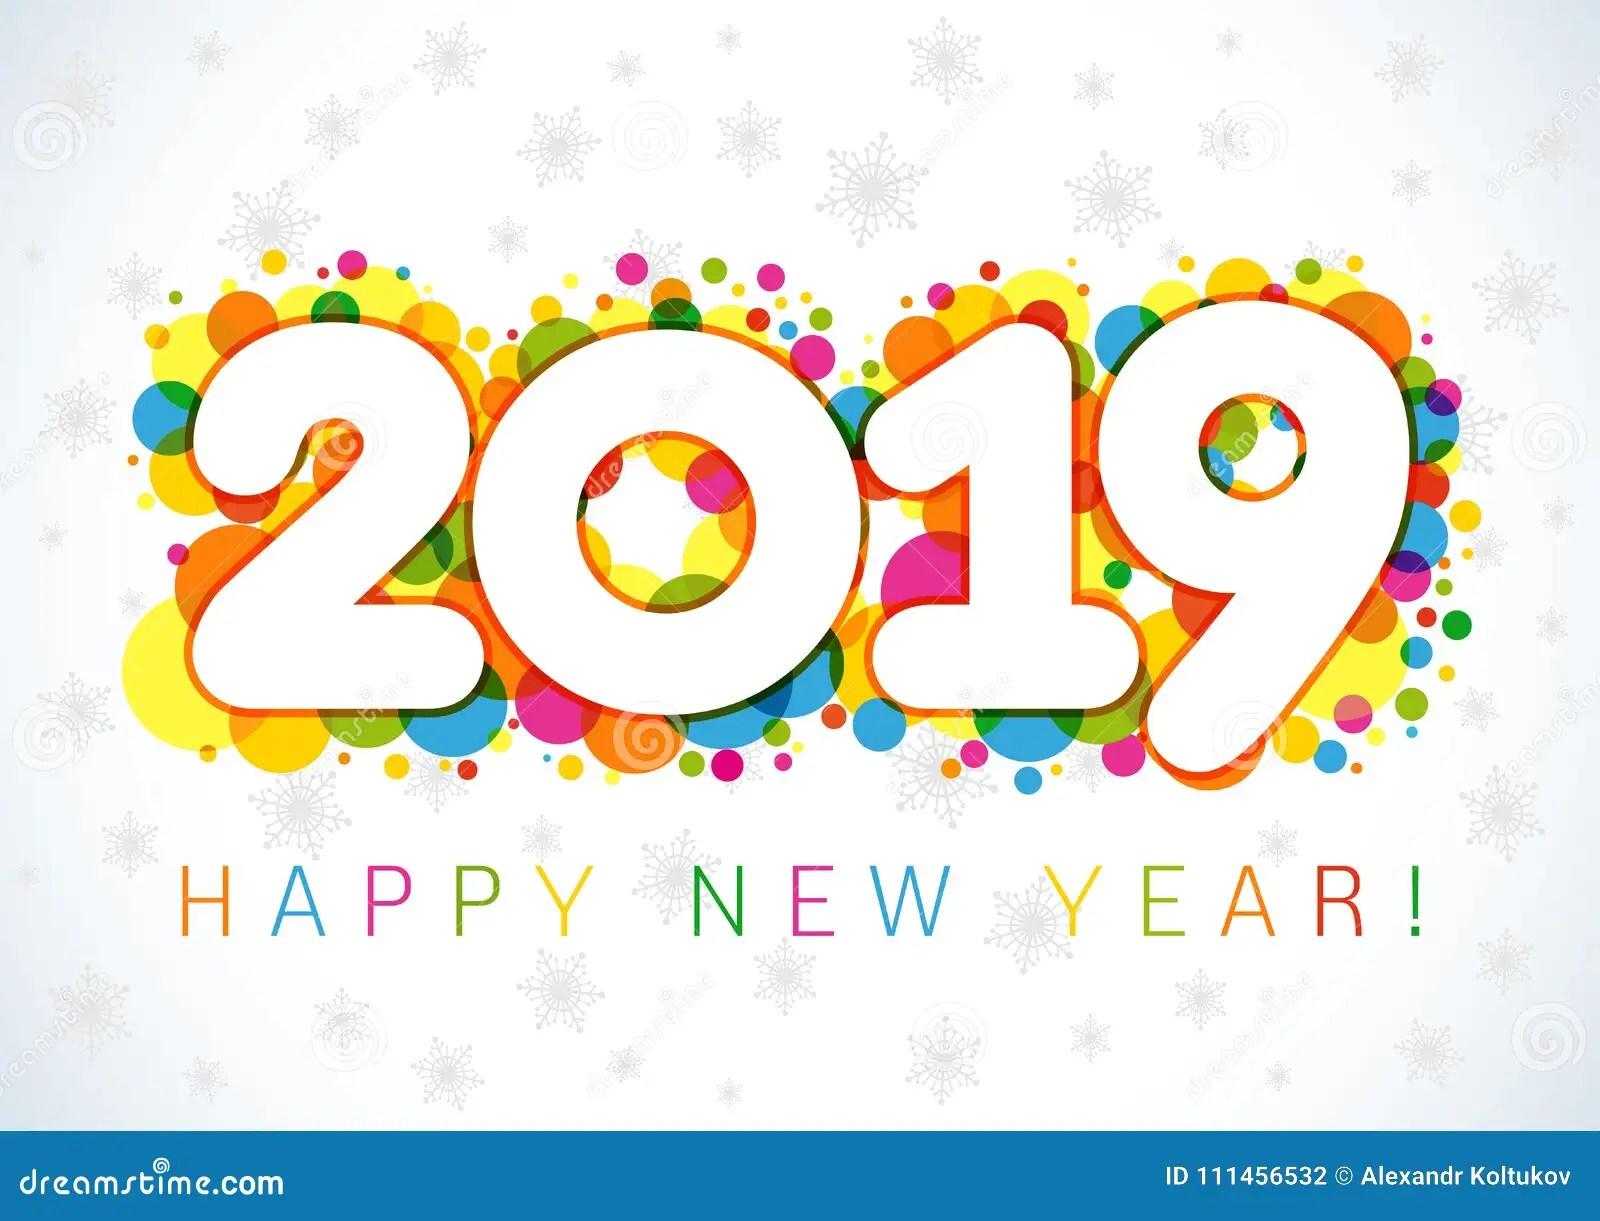 Happy New Year Xmas Greetings Stock Vector